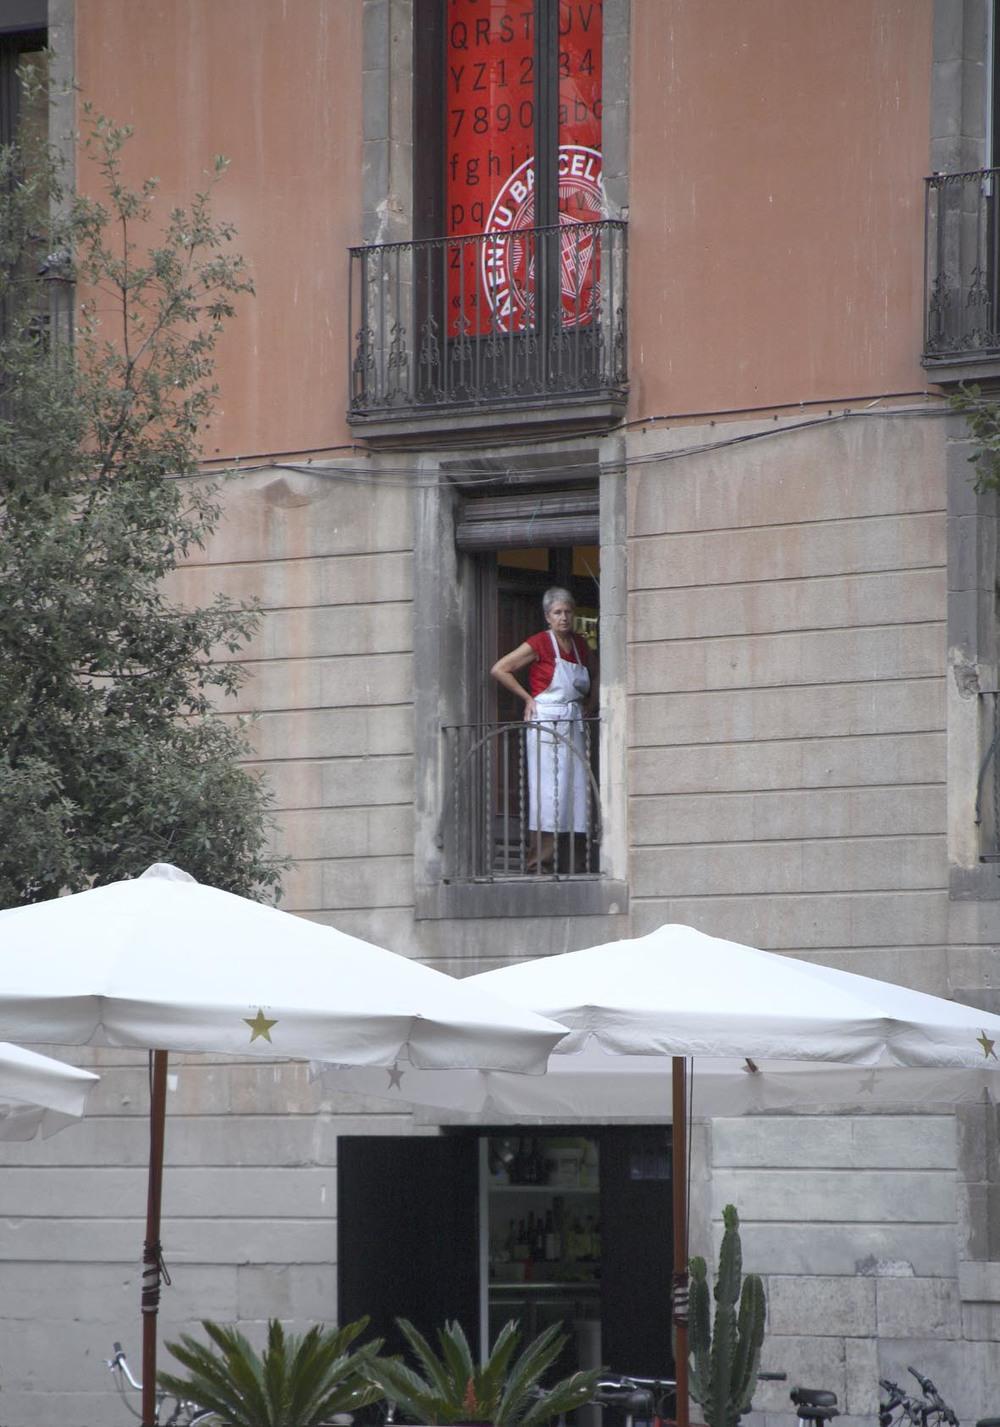 Barc parasol.jpg